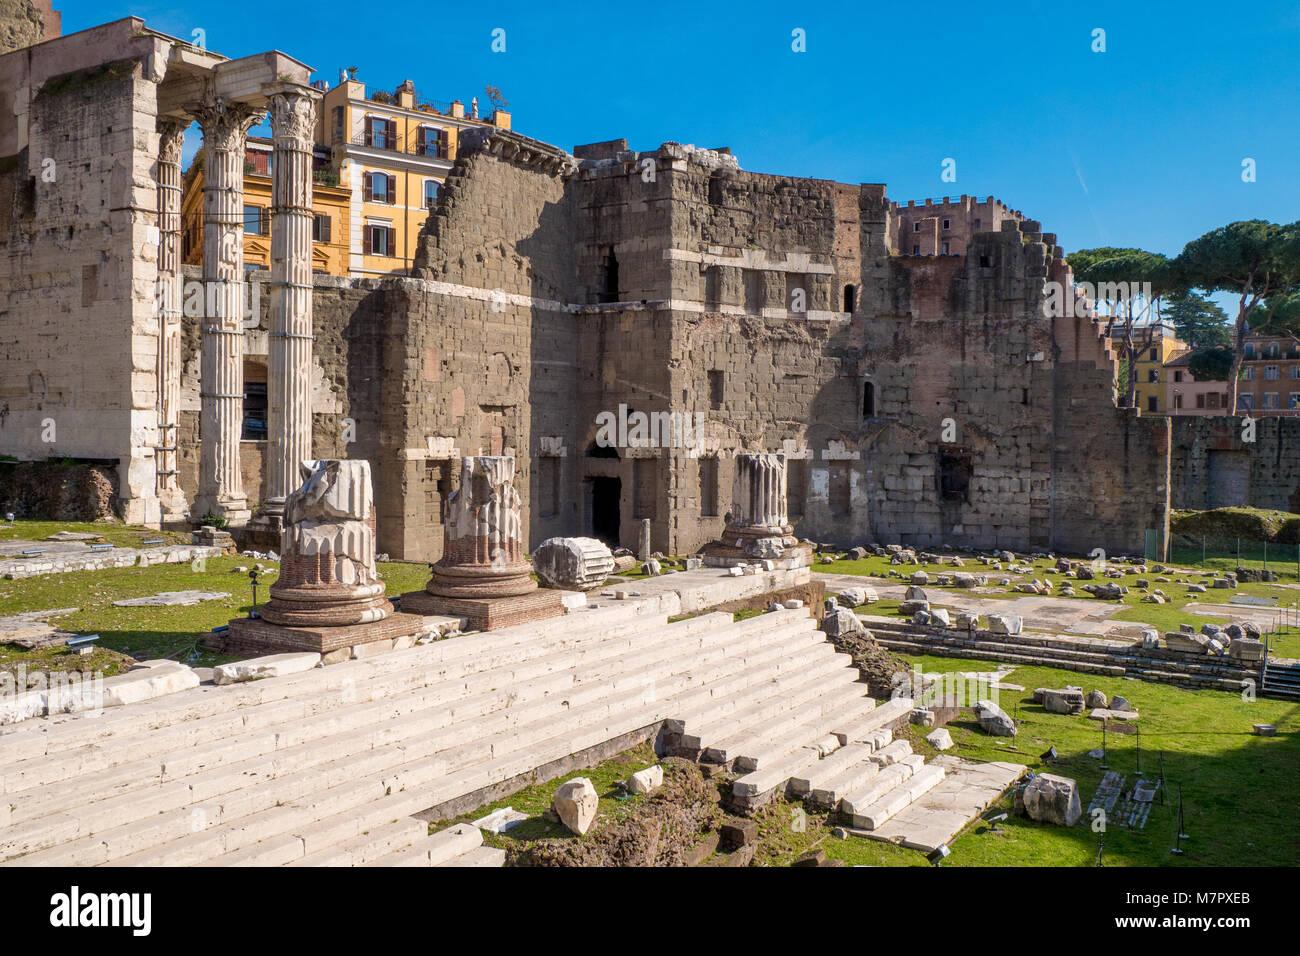 The Augustus Forum (Foro di Augusto) near the Roman Forum in Rome, Italy - Stock Image